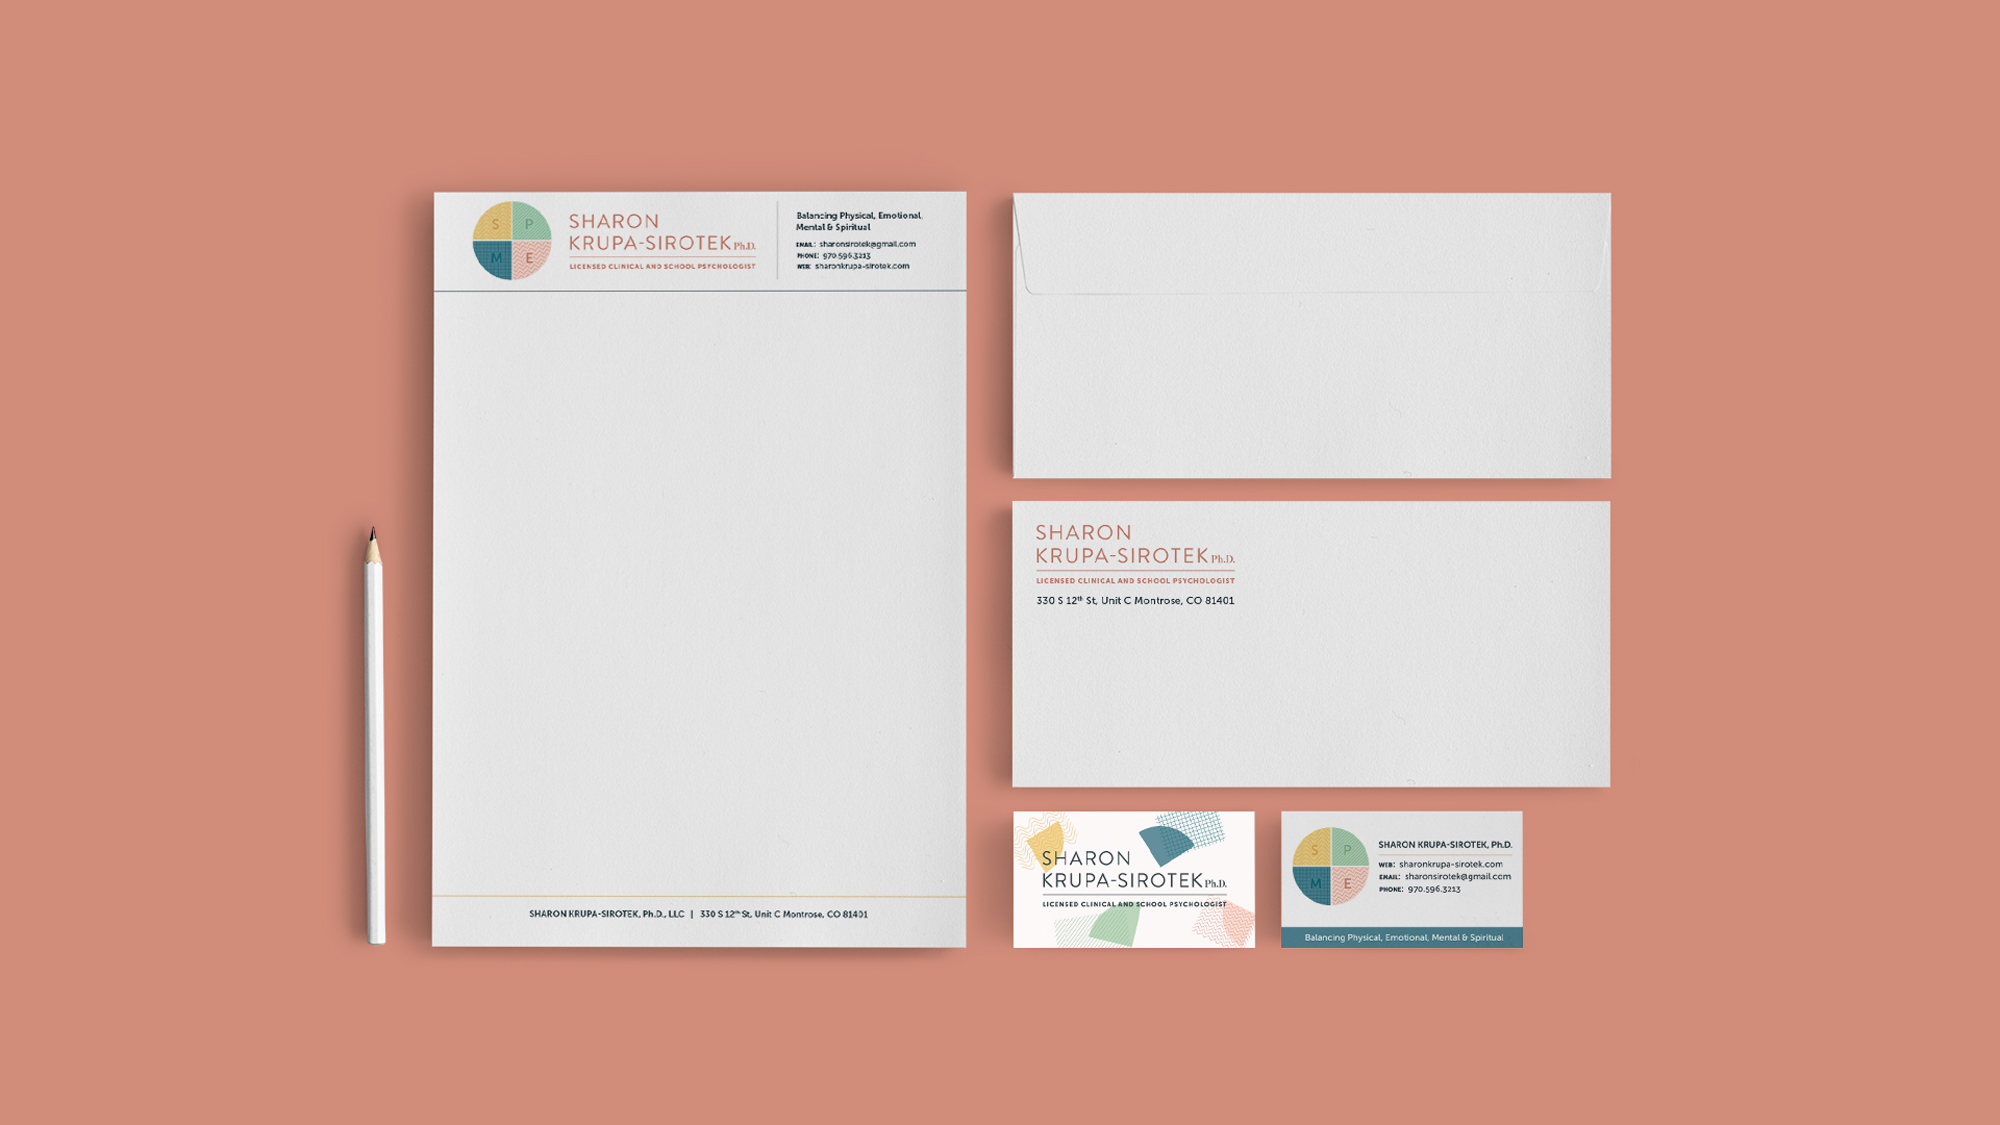 We designed a full brand identity suite for Sharon Krupa-Sirotek, including business cards, branded letterhead, and an envelope